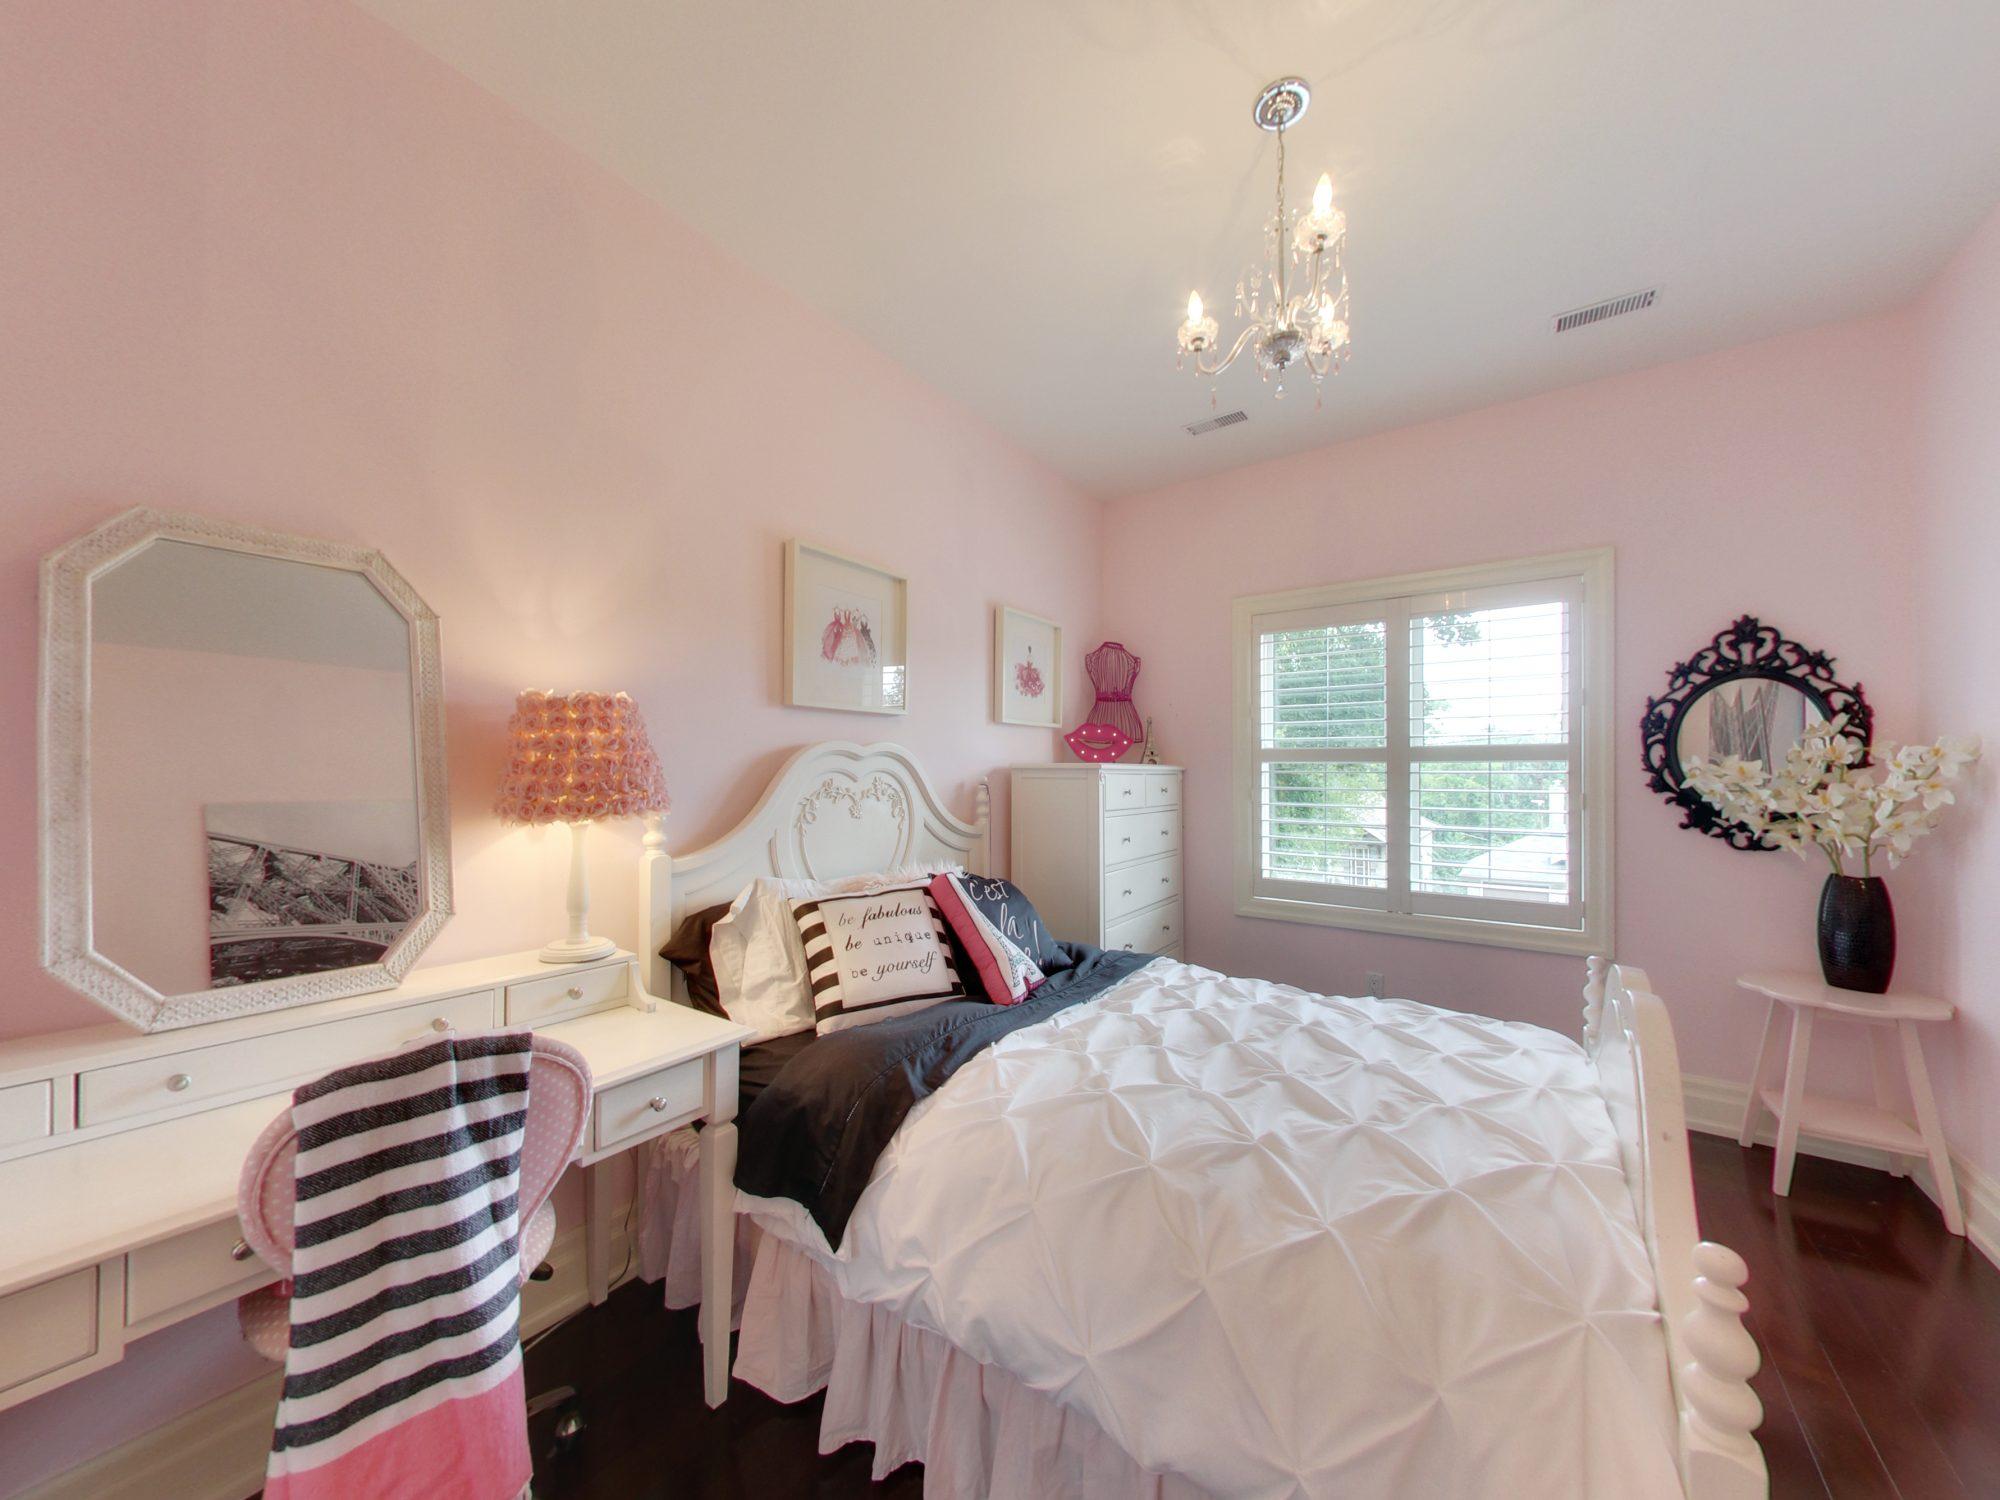 toronto-house-for-sale-15-shand-avenue-9